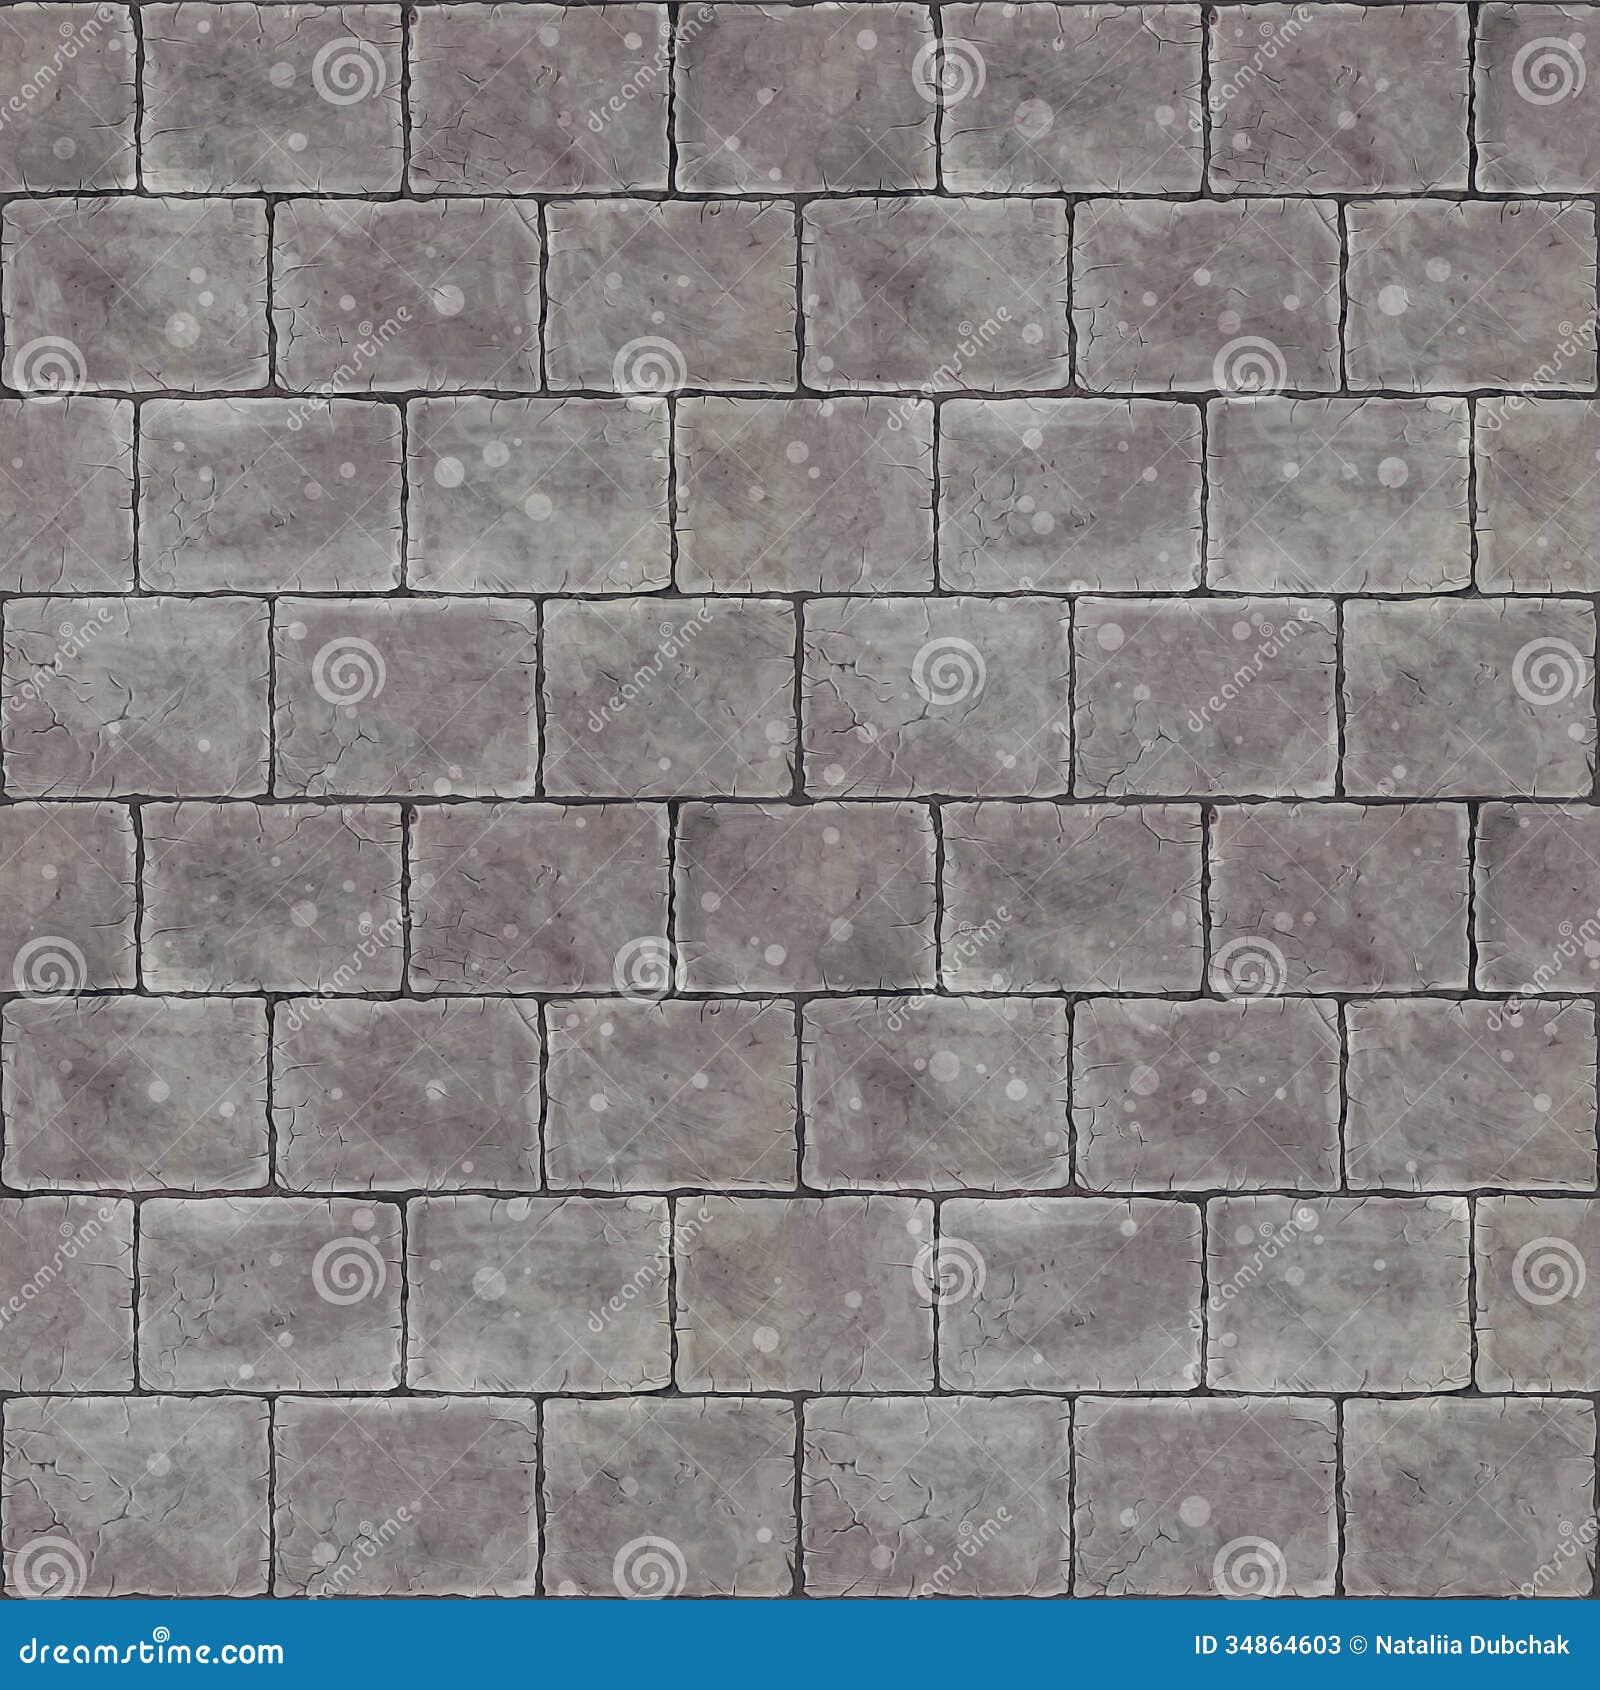 Stone Tile Seamless Background Stock Photos - Image: 34864603